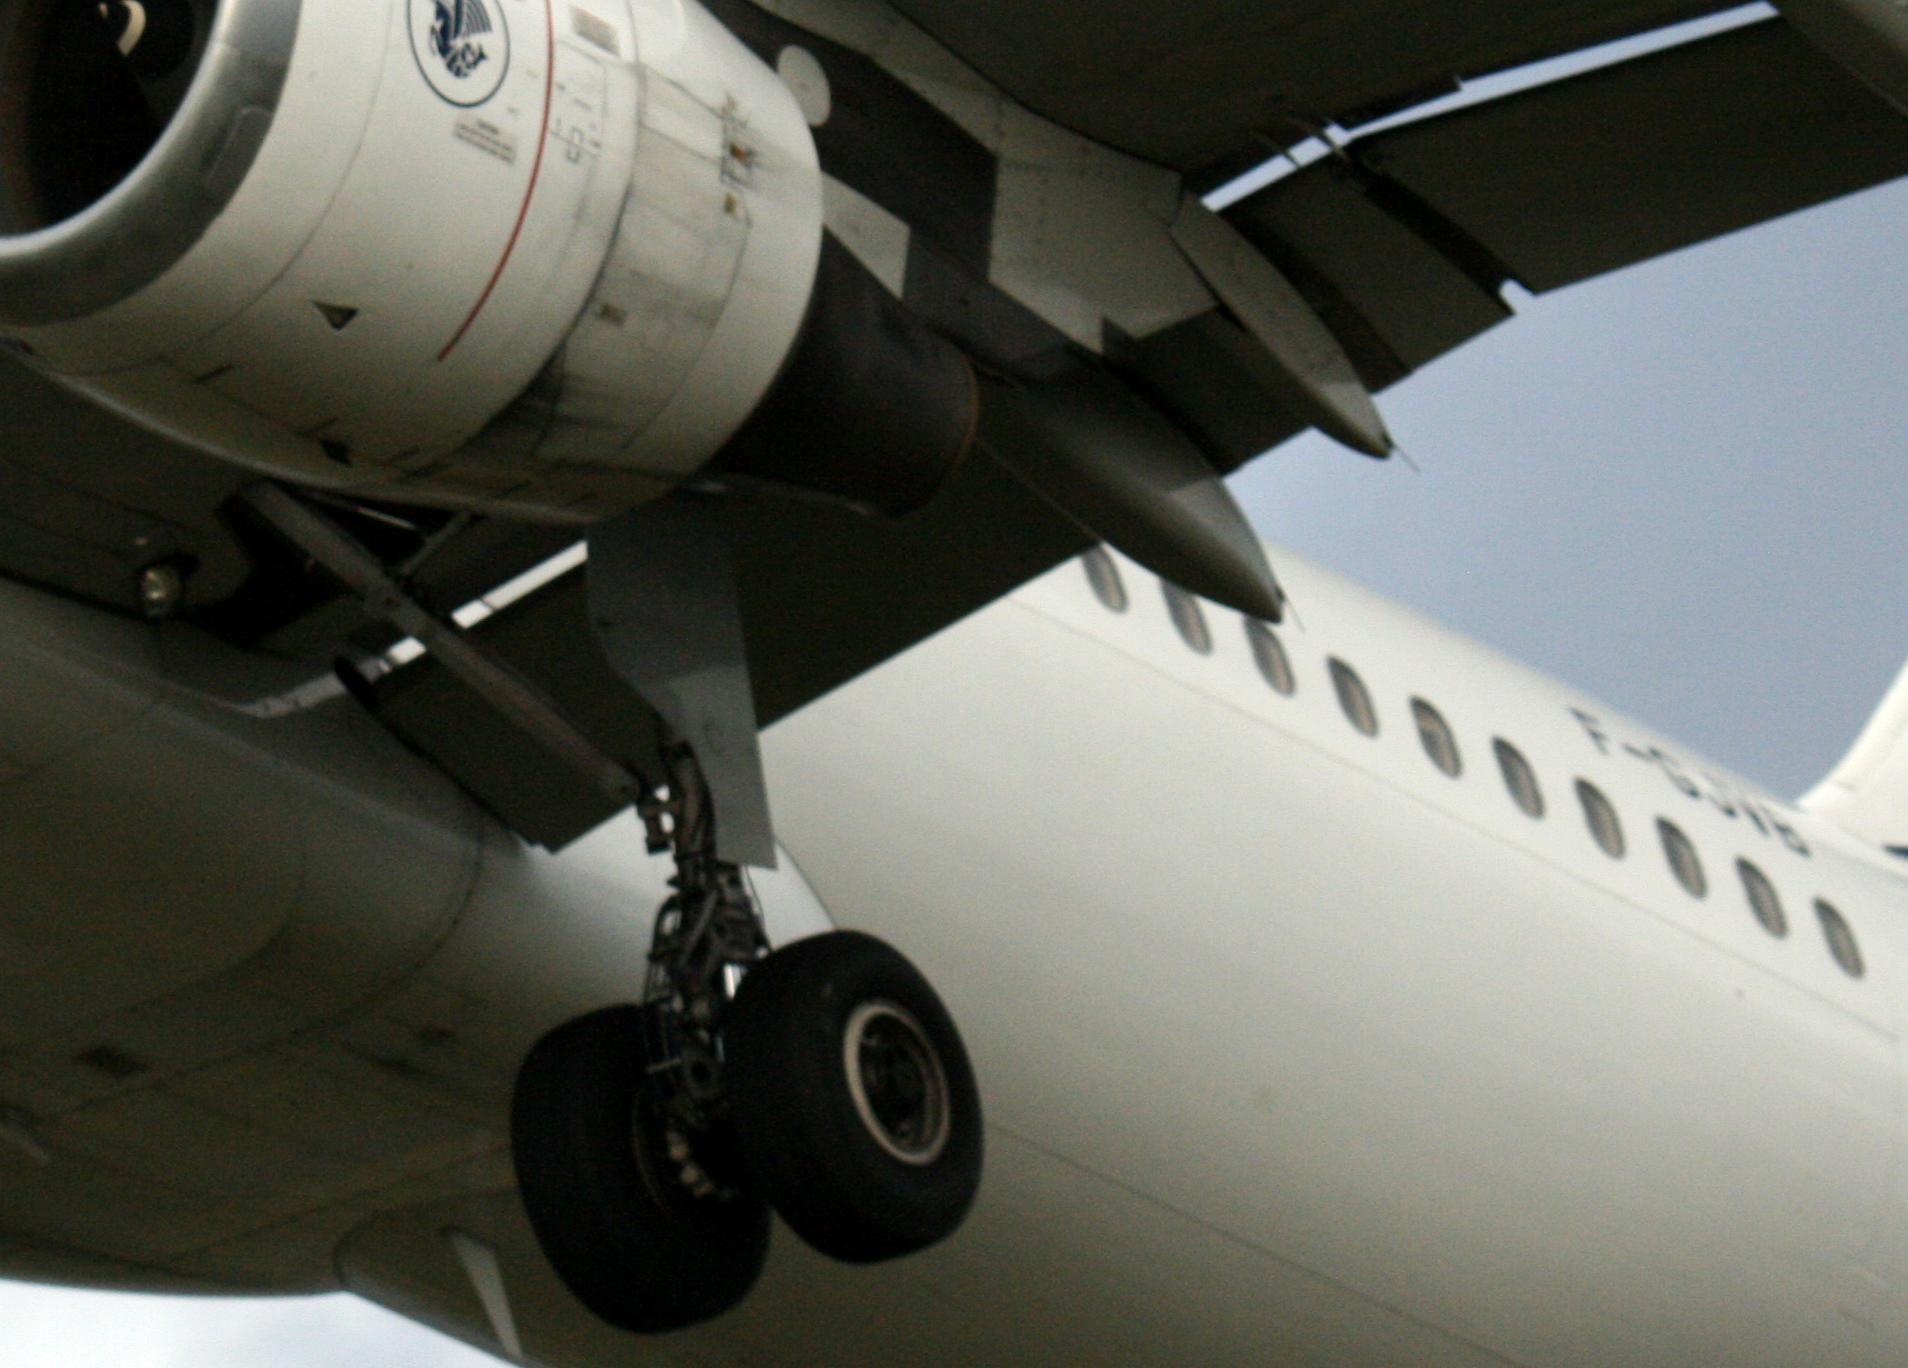 Vliegtuig maakt noodlanding na hevige turbulentie. 21 gewonden